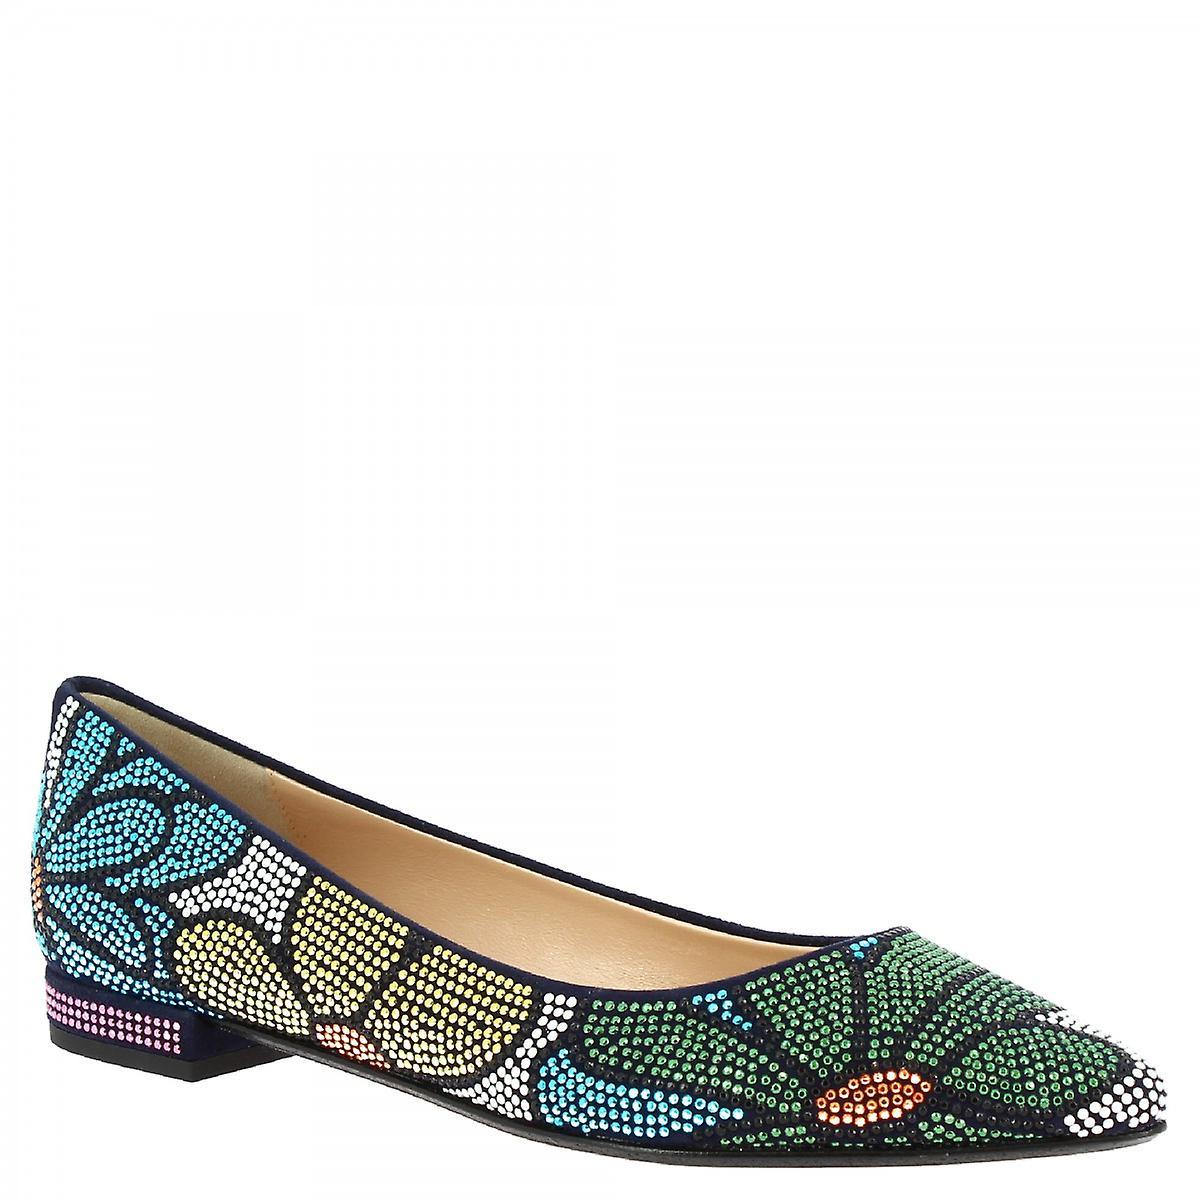 Leonardo Shoes Women's handmade ballet flats multicolored strass floral pattern BgxFg